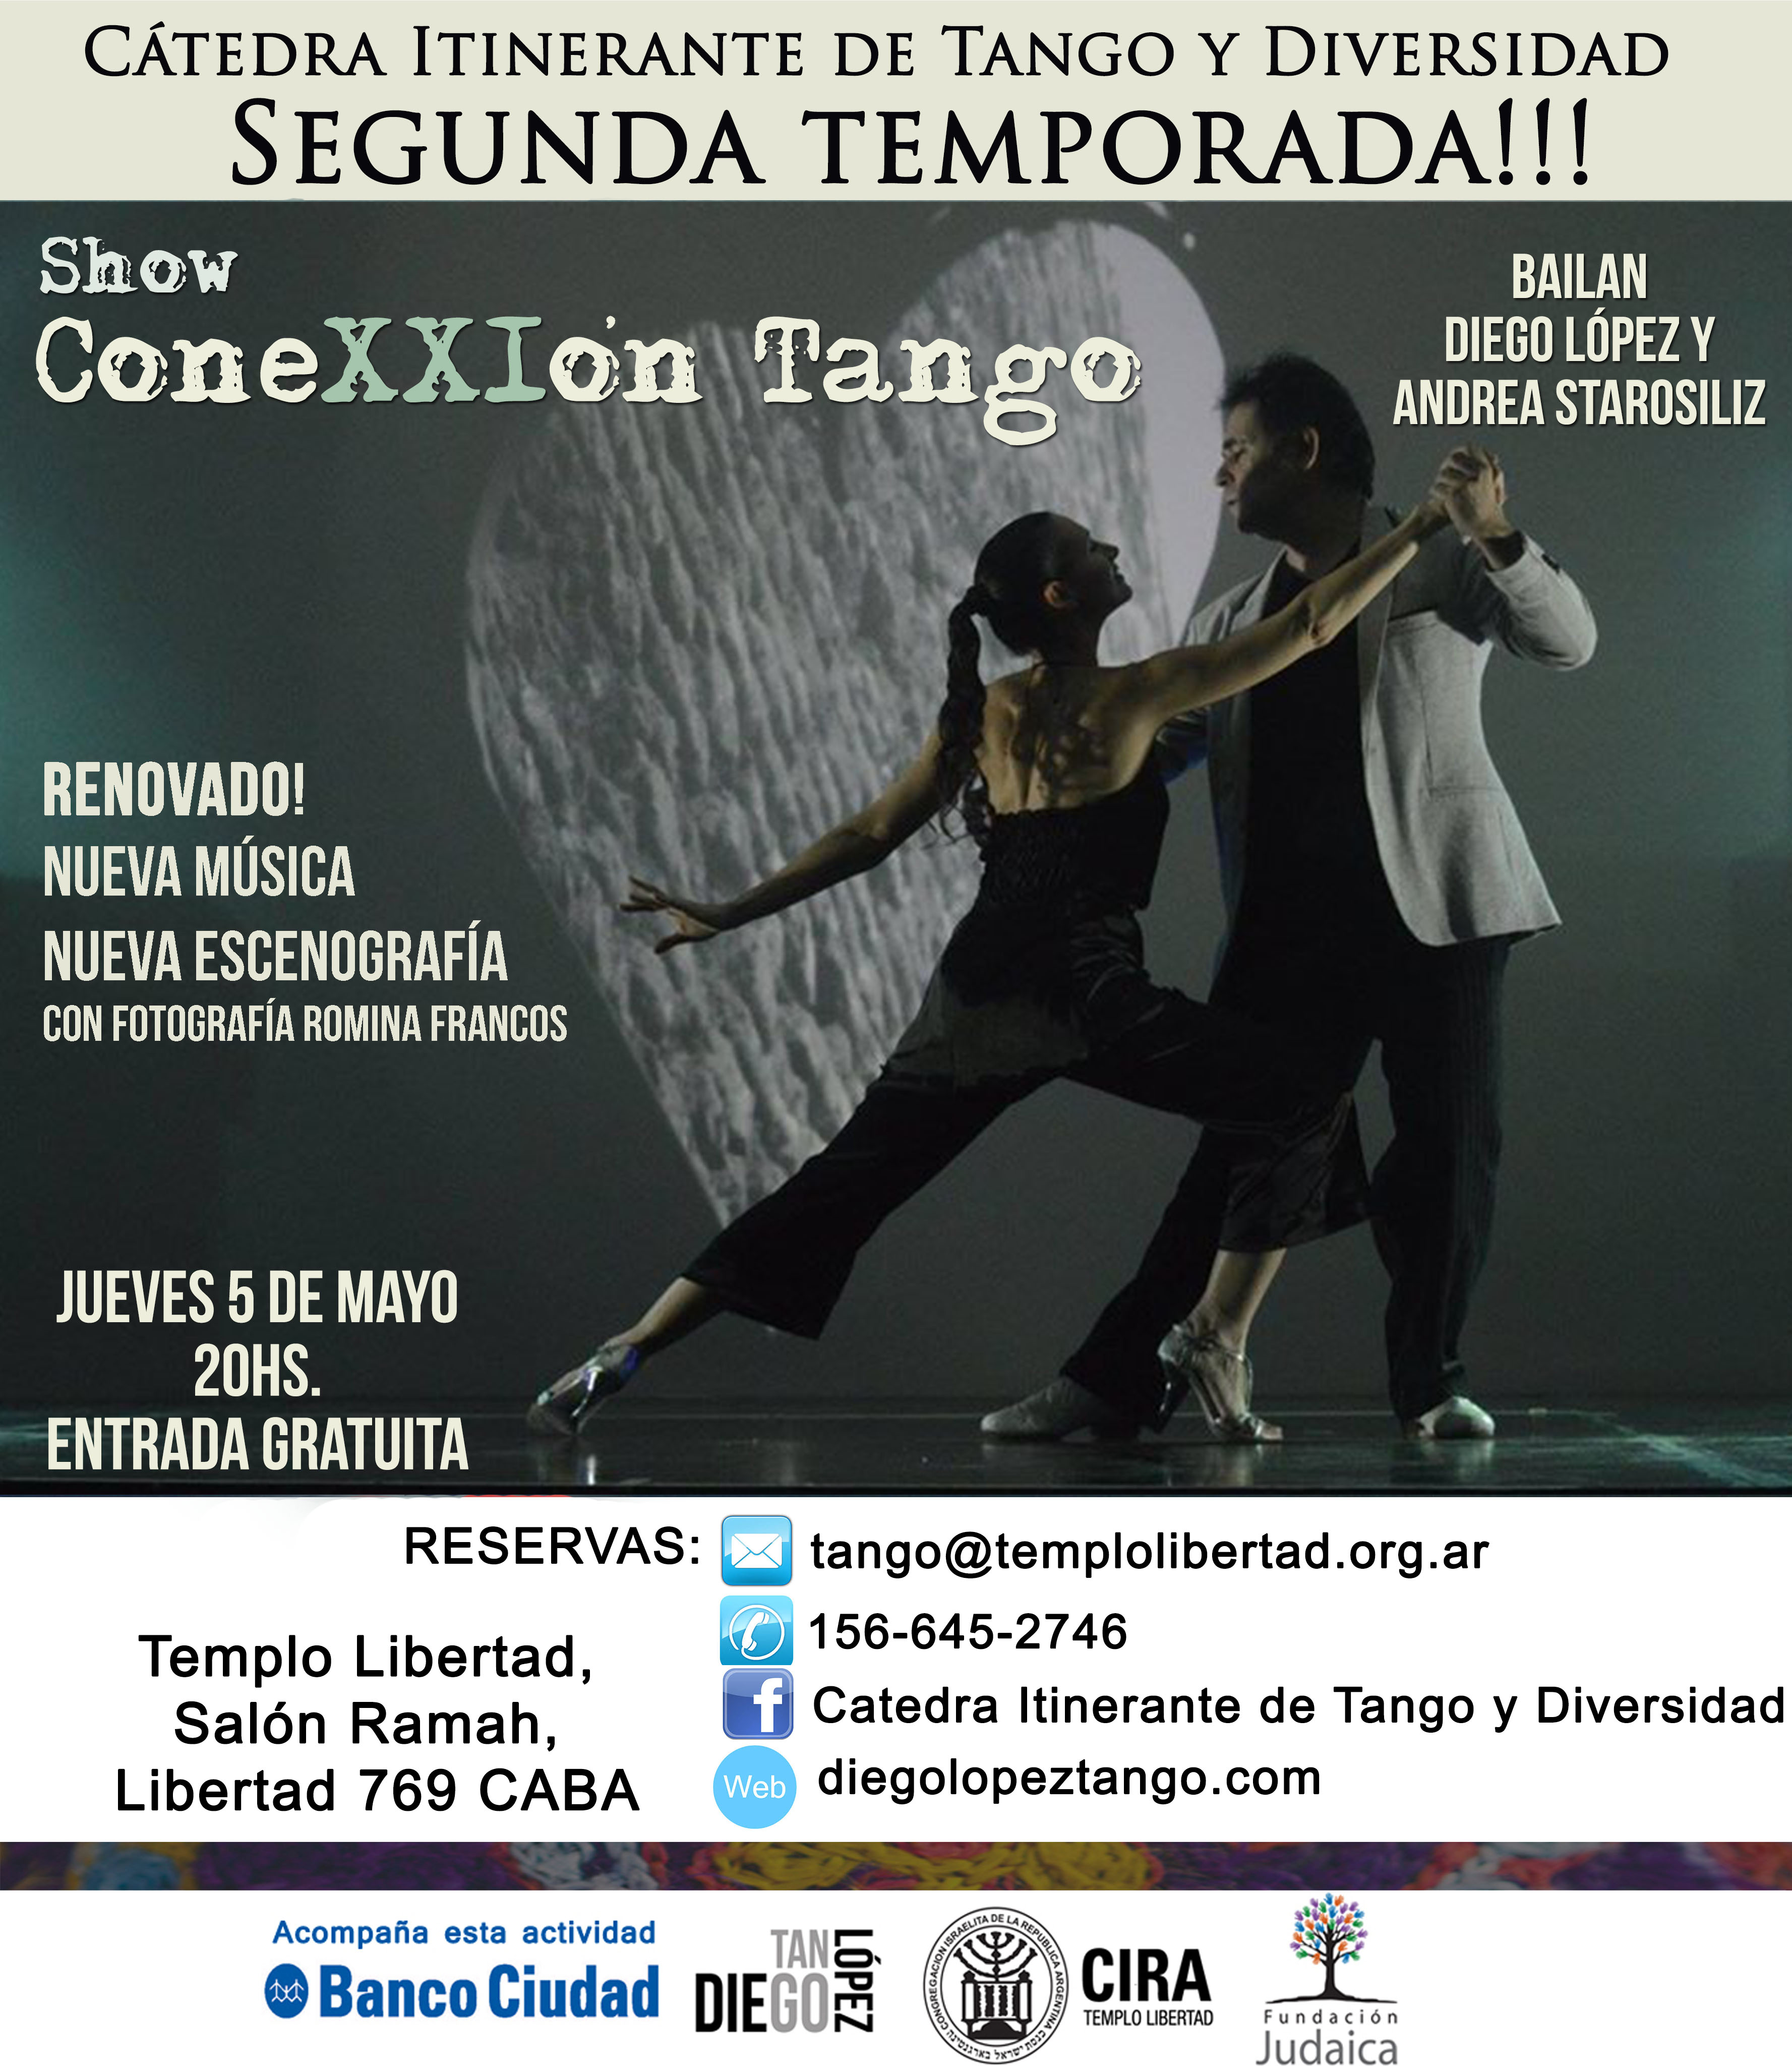 ConeXXIon tango 5 de Mayo